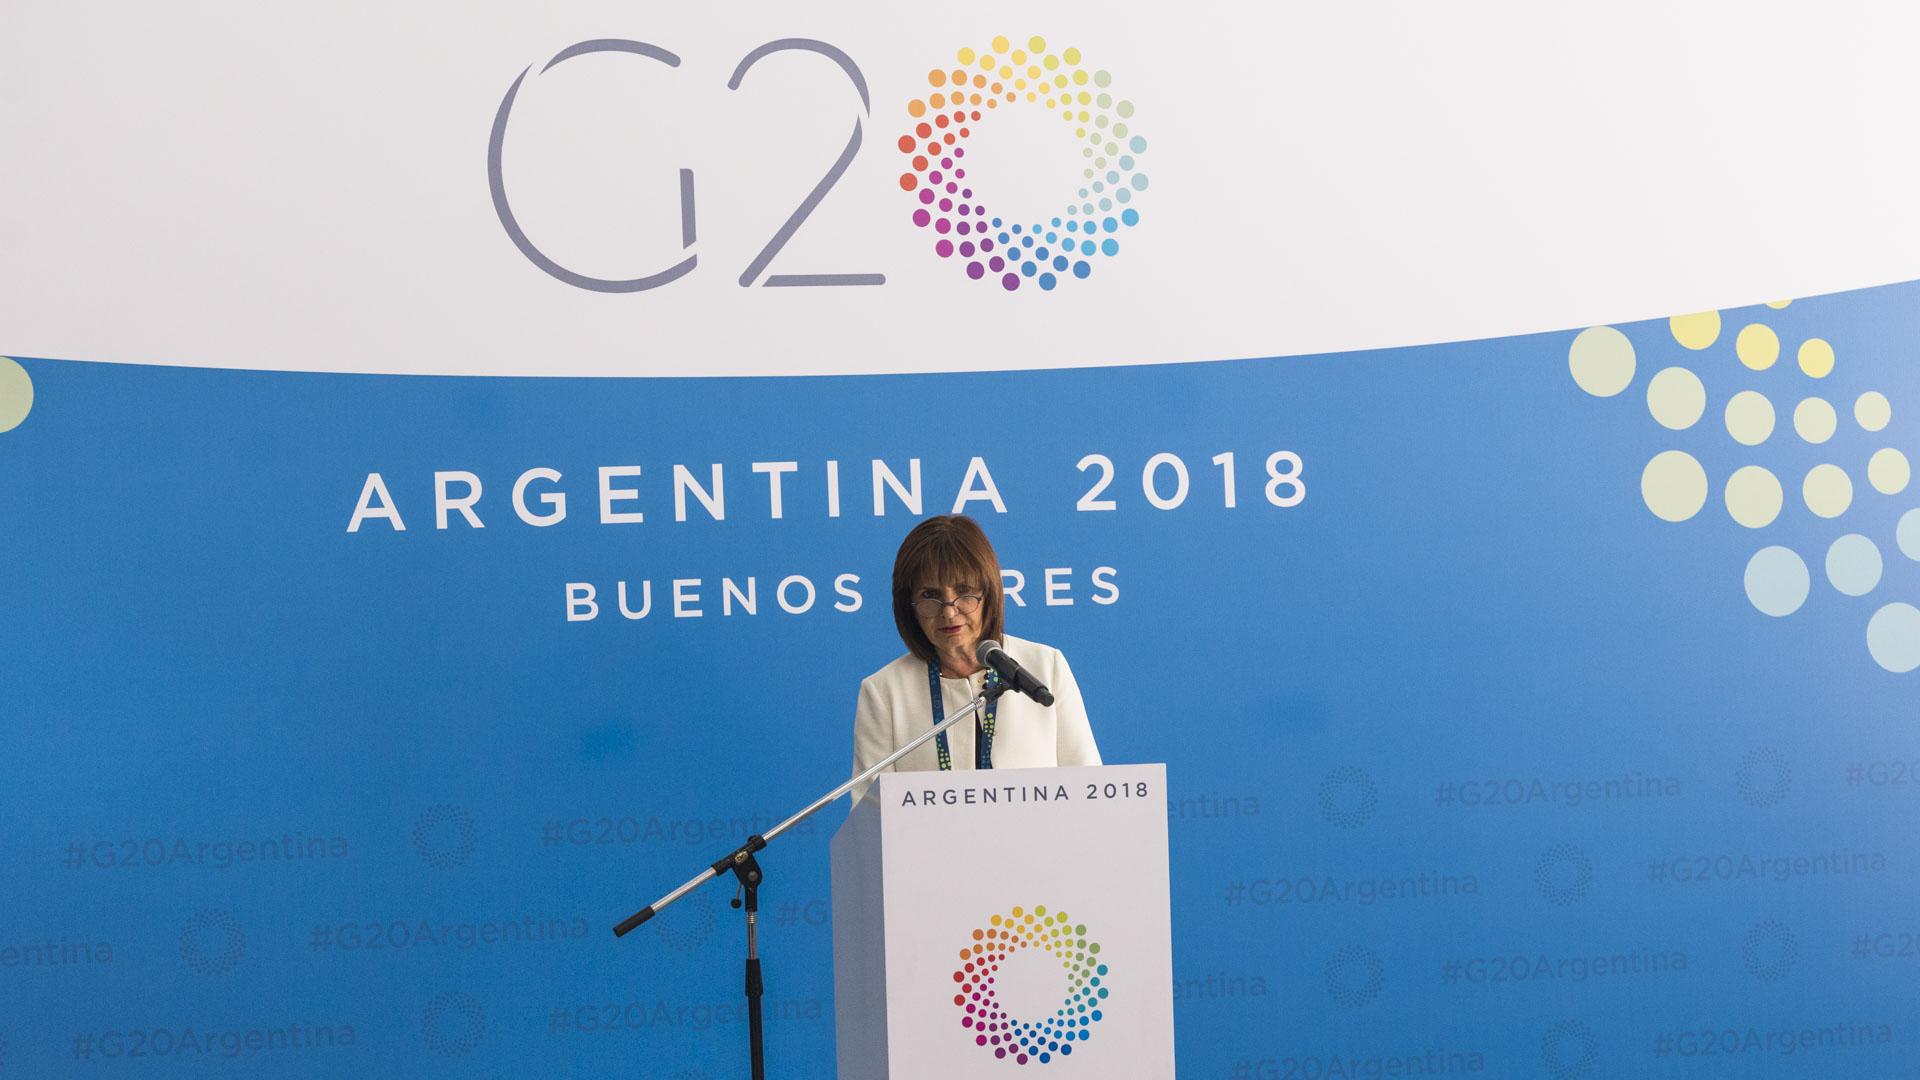 Patricia Bullrich, ministra de Seguridad (Julieta Ferrario)